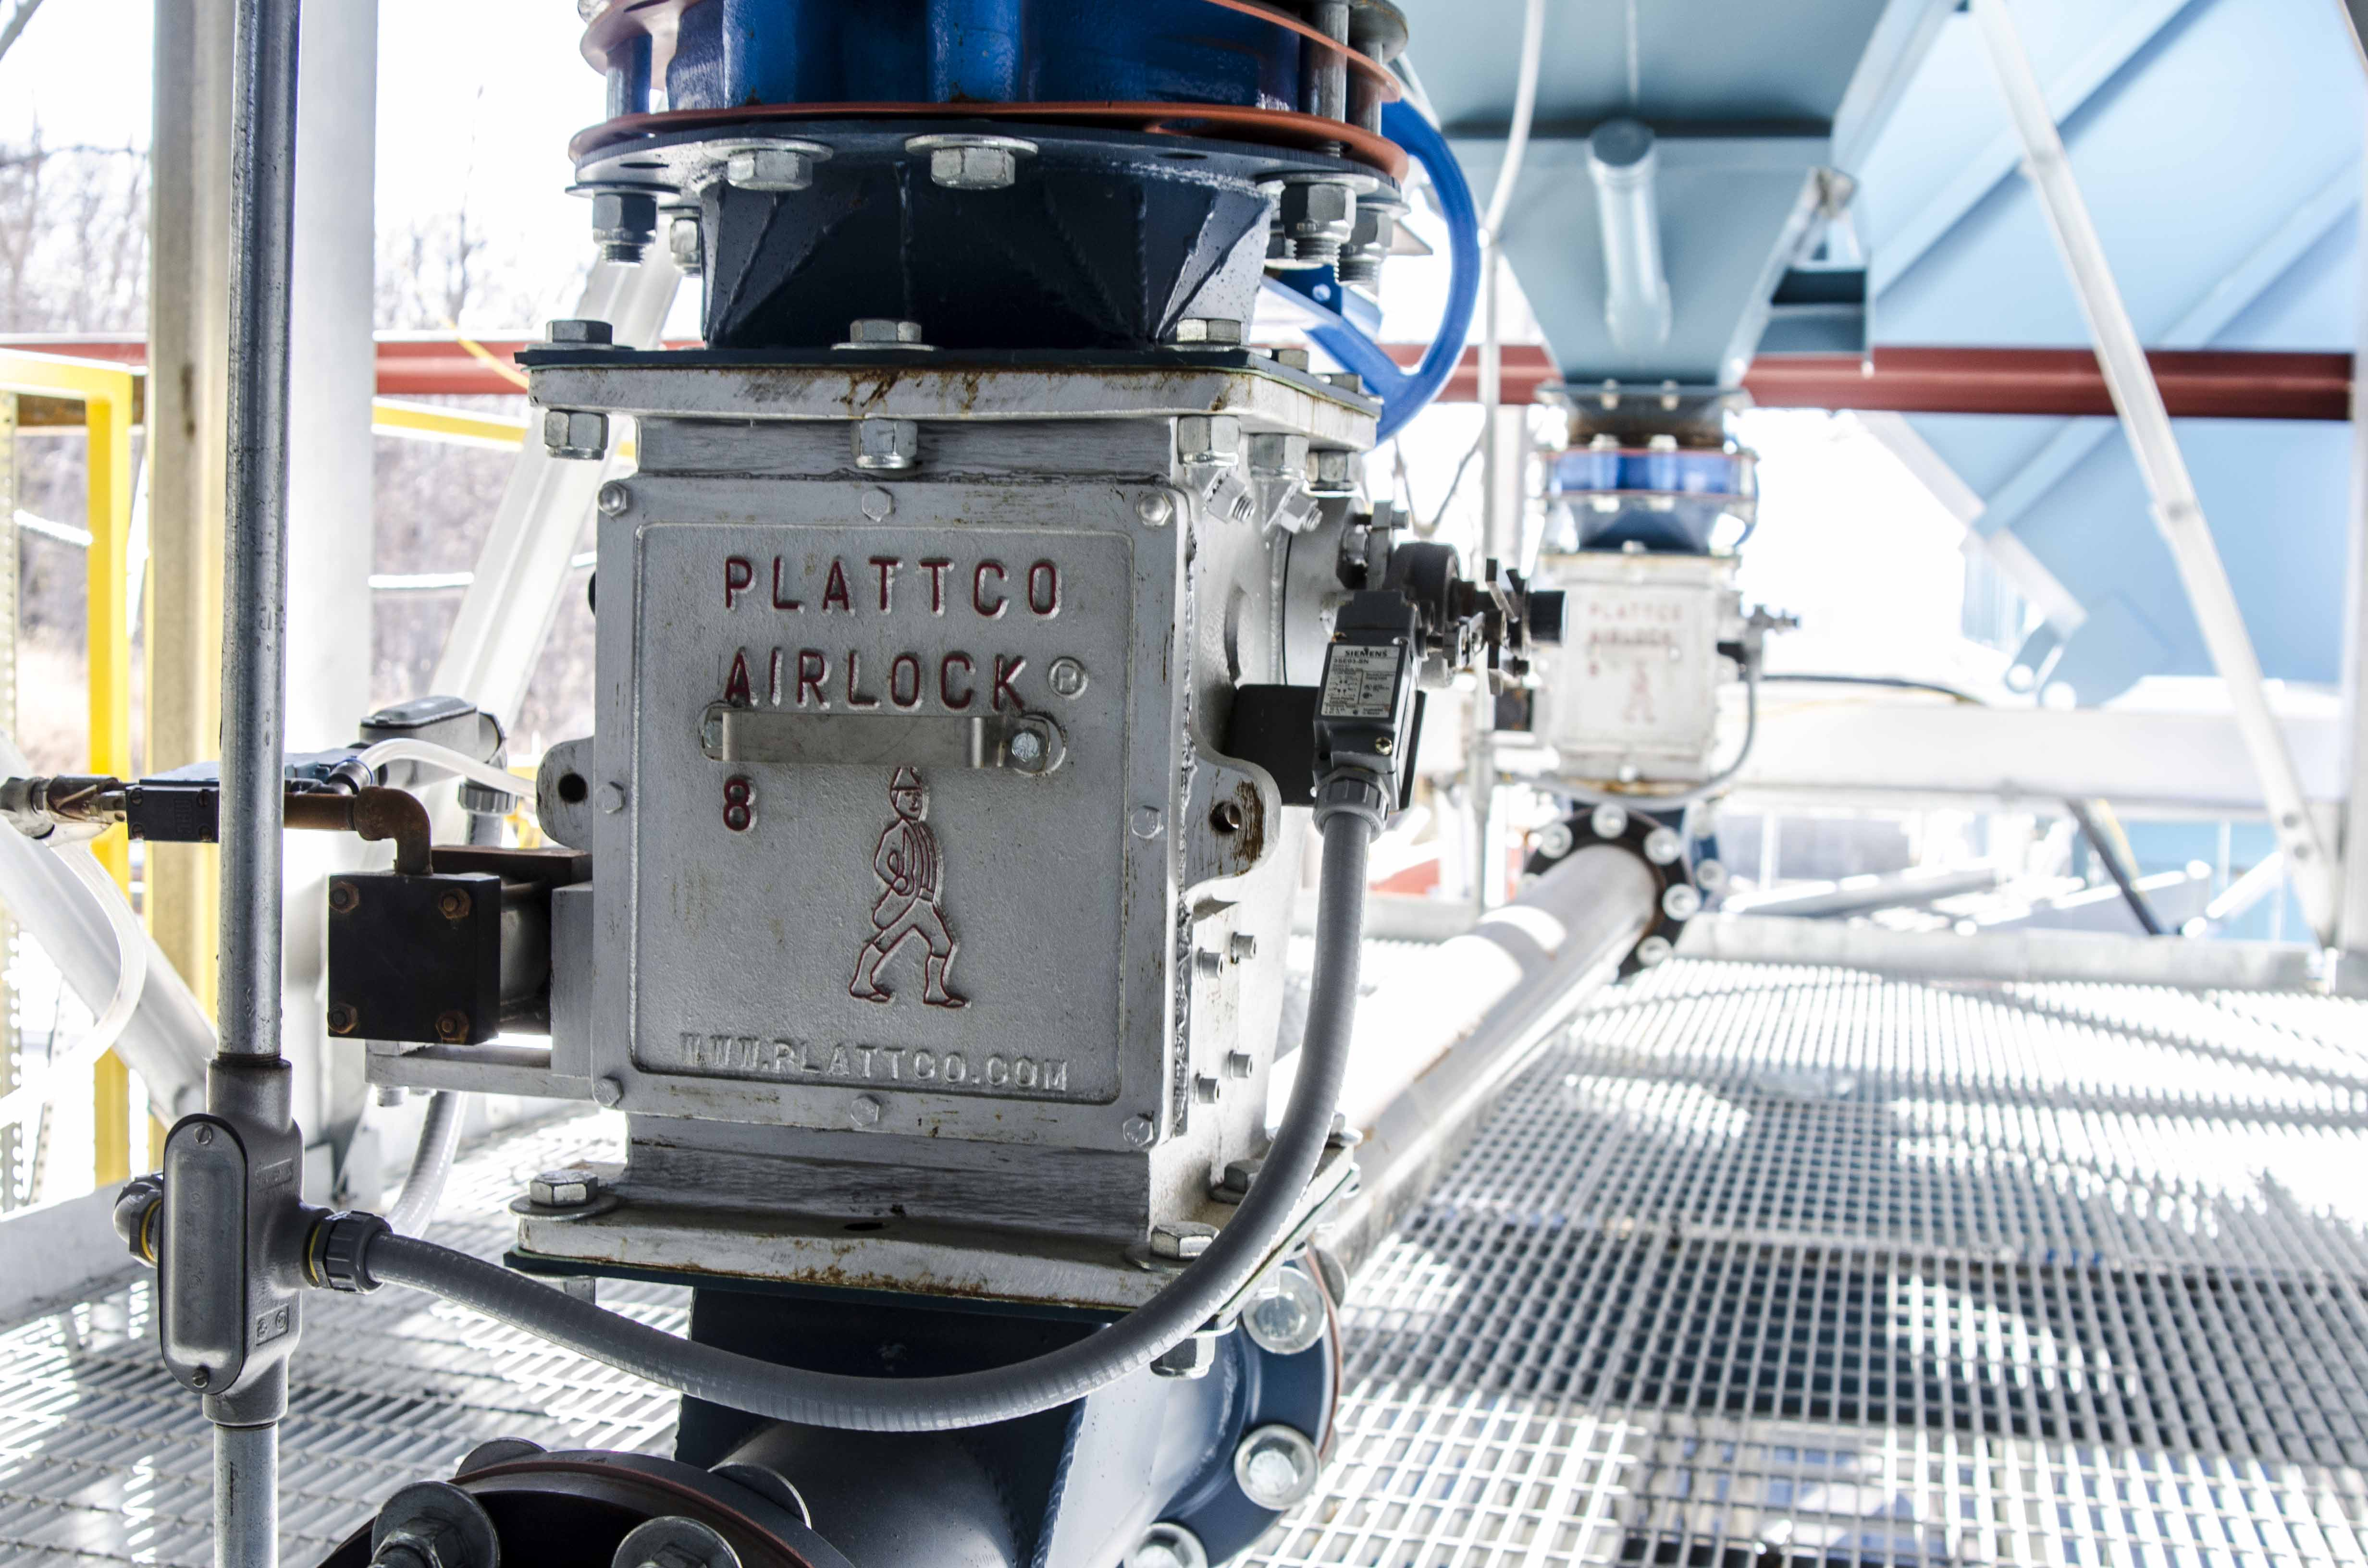 Plattco Corporation